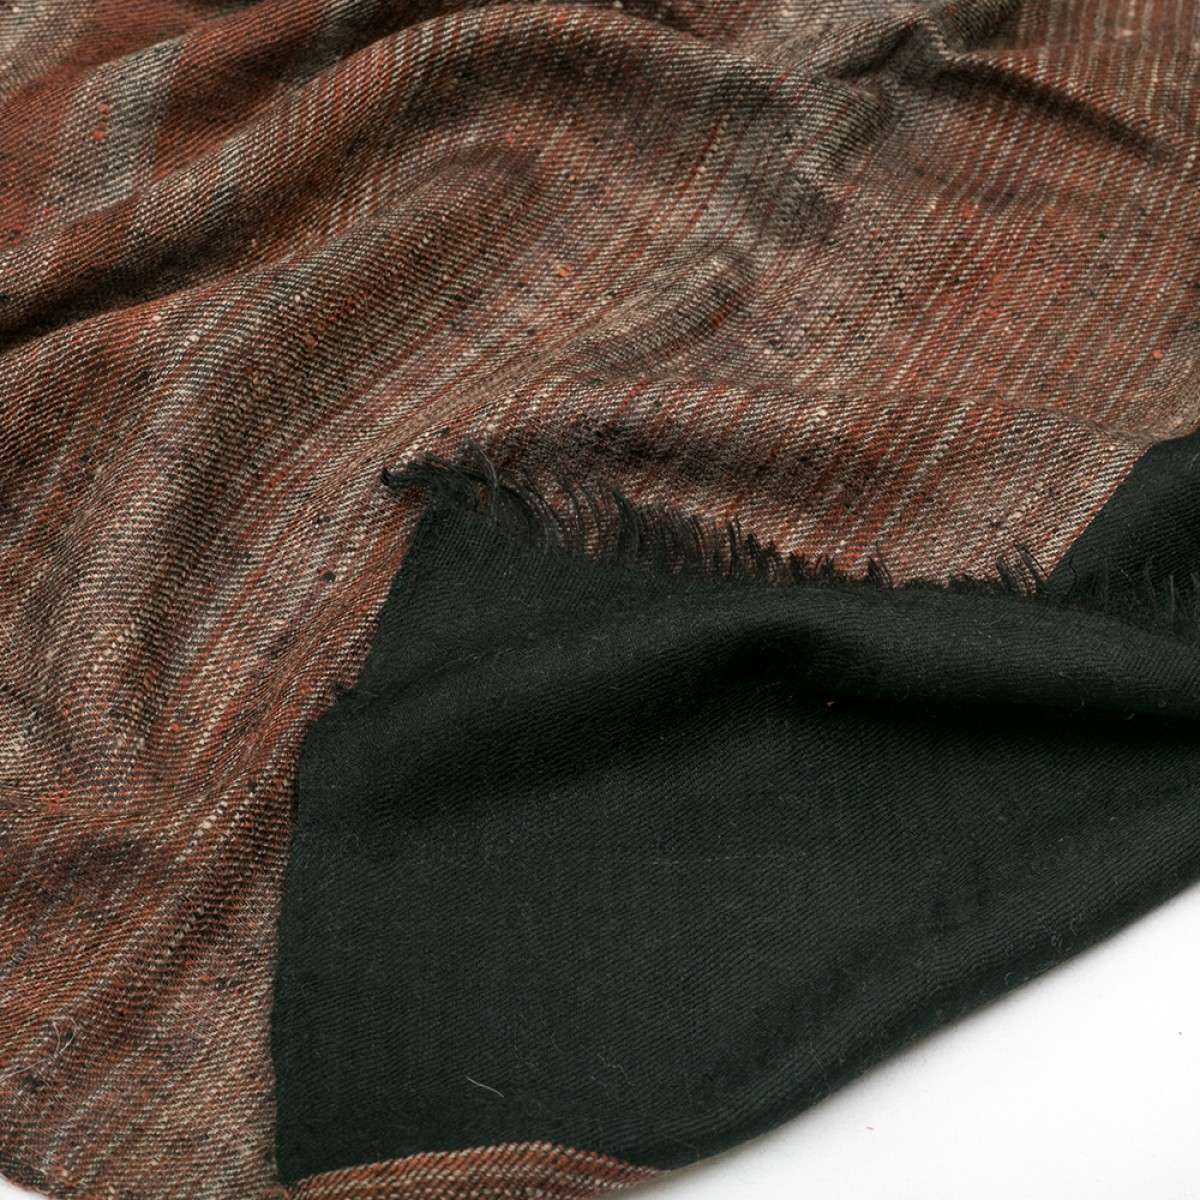 Ikat Cashmere Pashmina Stole - Brown & Black